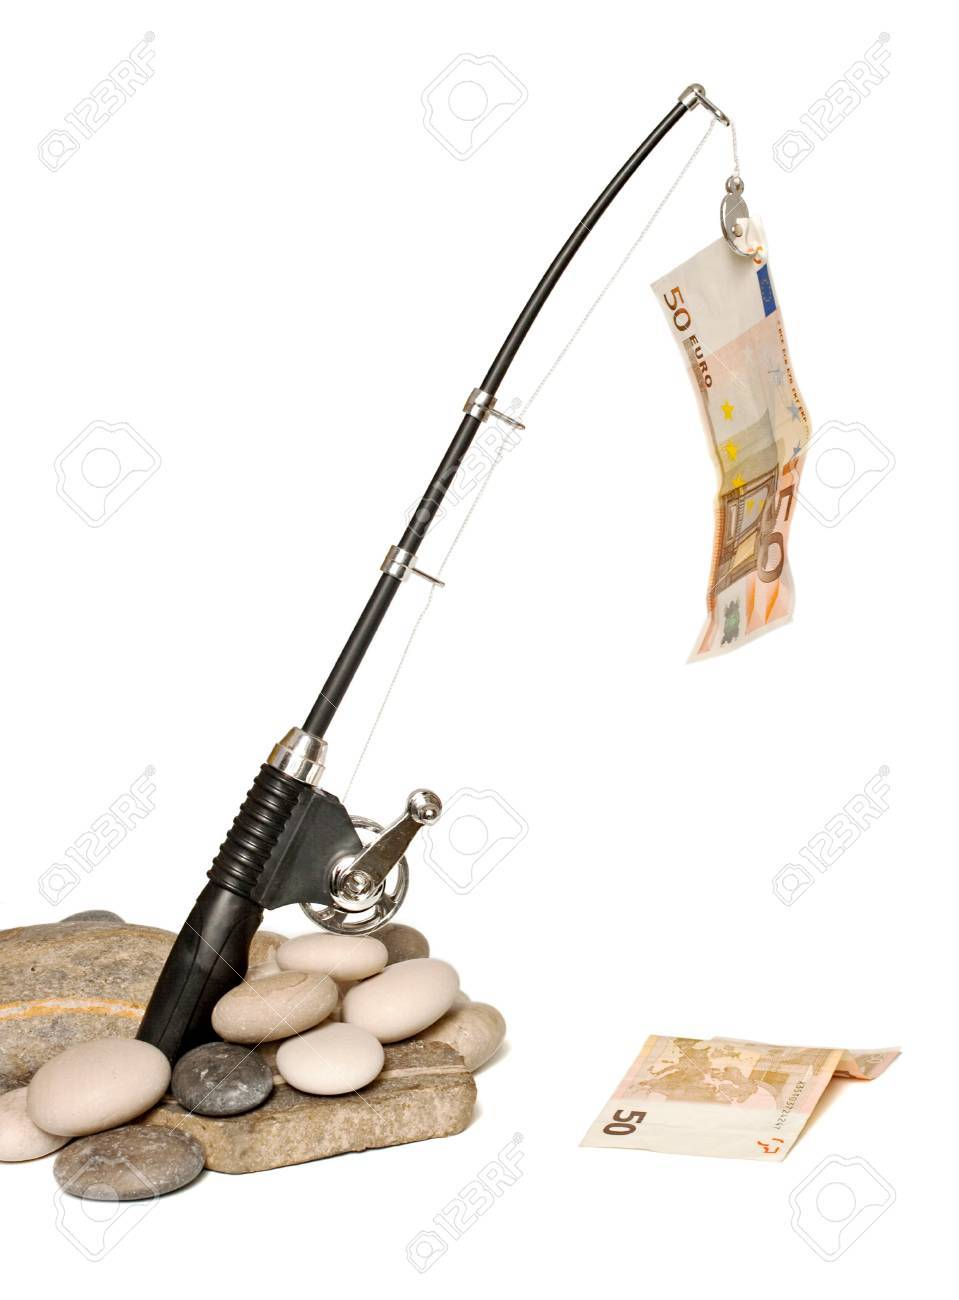 Fishing rod while fishing euro bills Stock Photo - 9937015